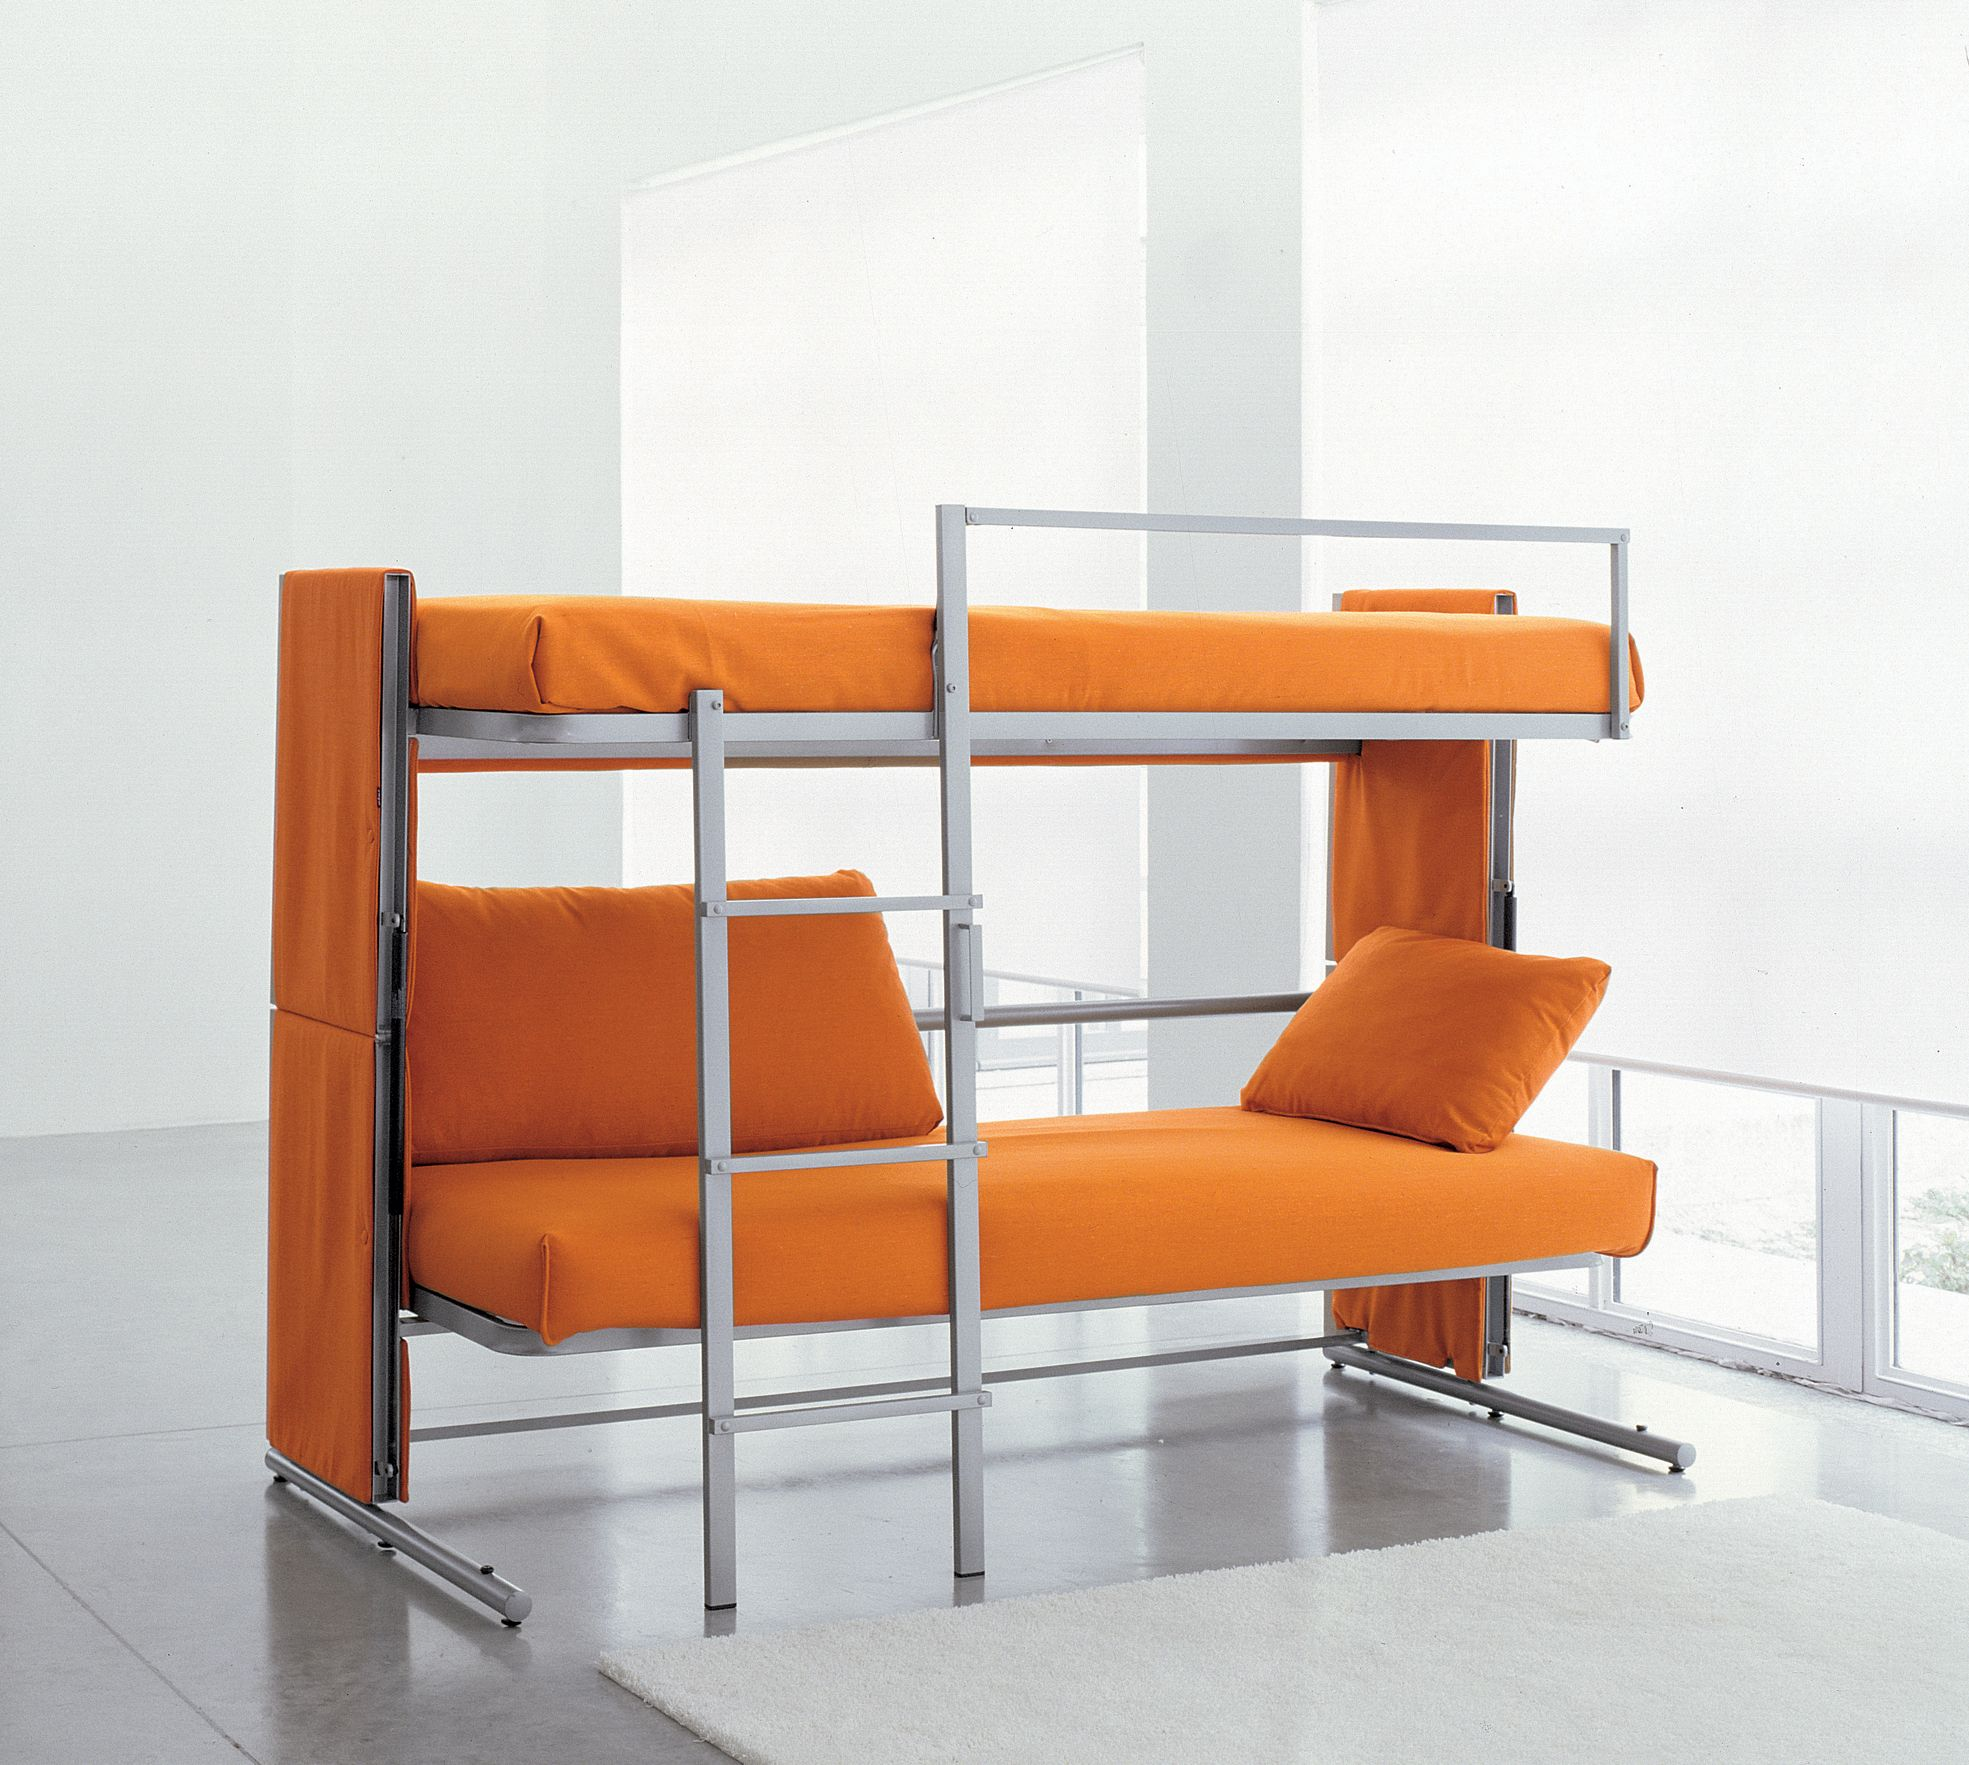 Magnificent Doc Sofa Bunk Bed Futon Bunk Bed Bunk Bed Designs Creativecarmelina Interior Chair Design Creativecarmelinacom